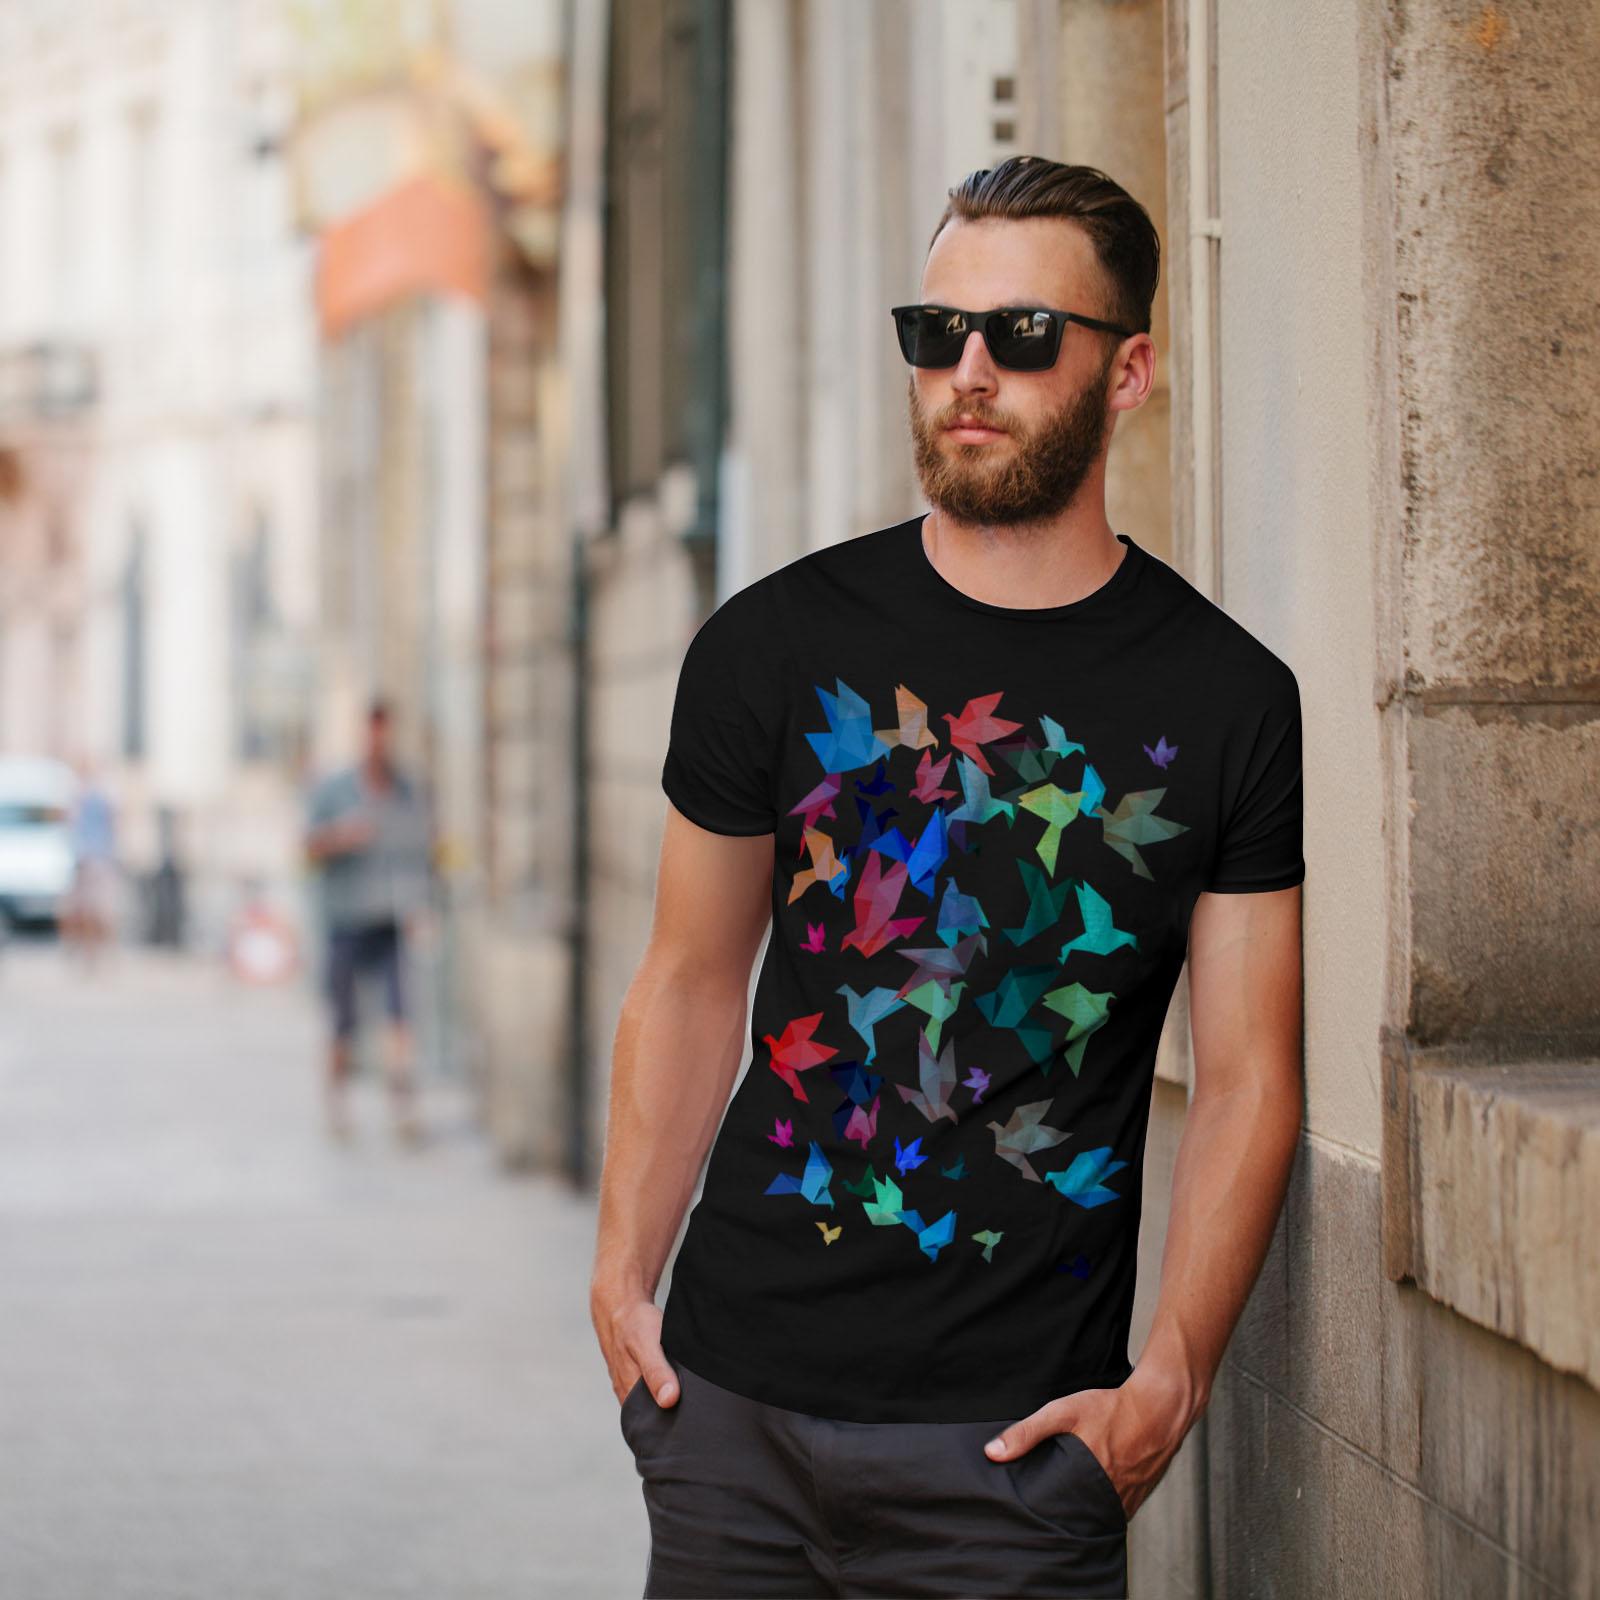 Wellcoda-Origami-Bird-Colors-Mens-T-shirt-Craft-Graphic-Design-Printed-Tee thumbnail 5